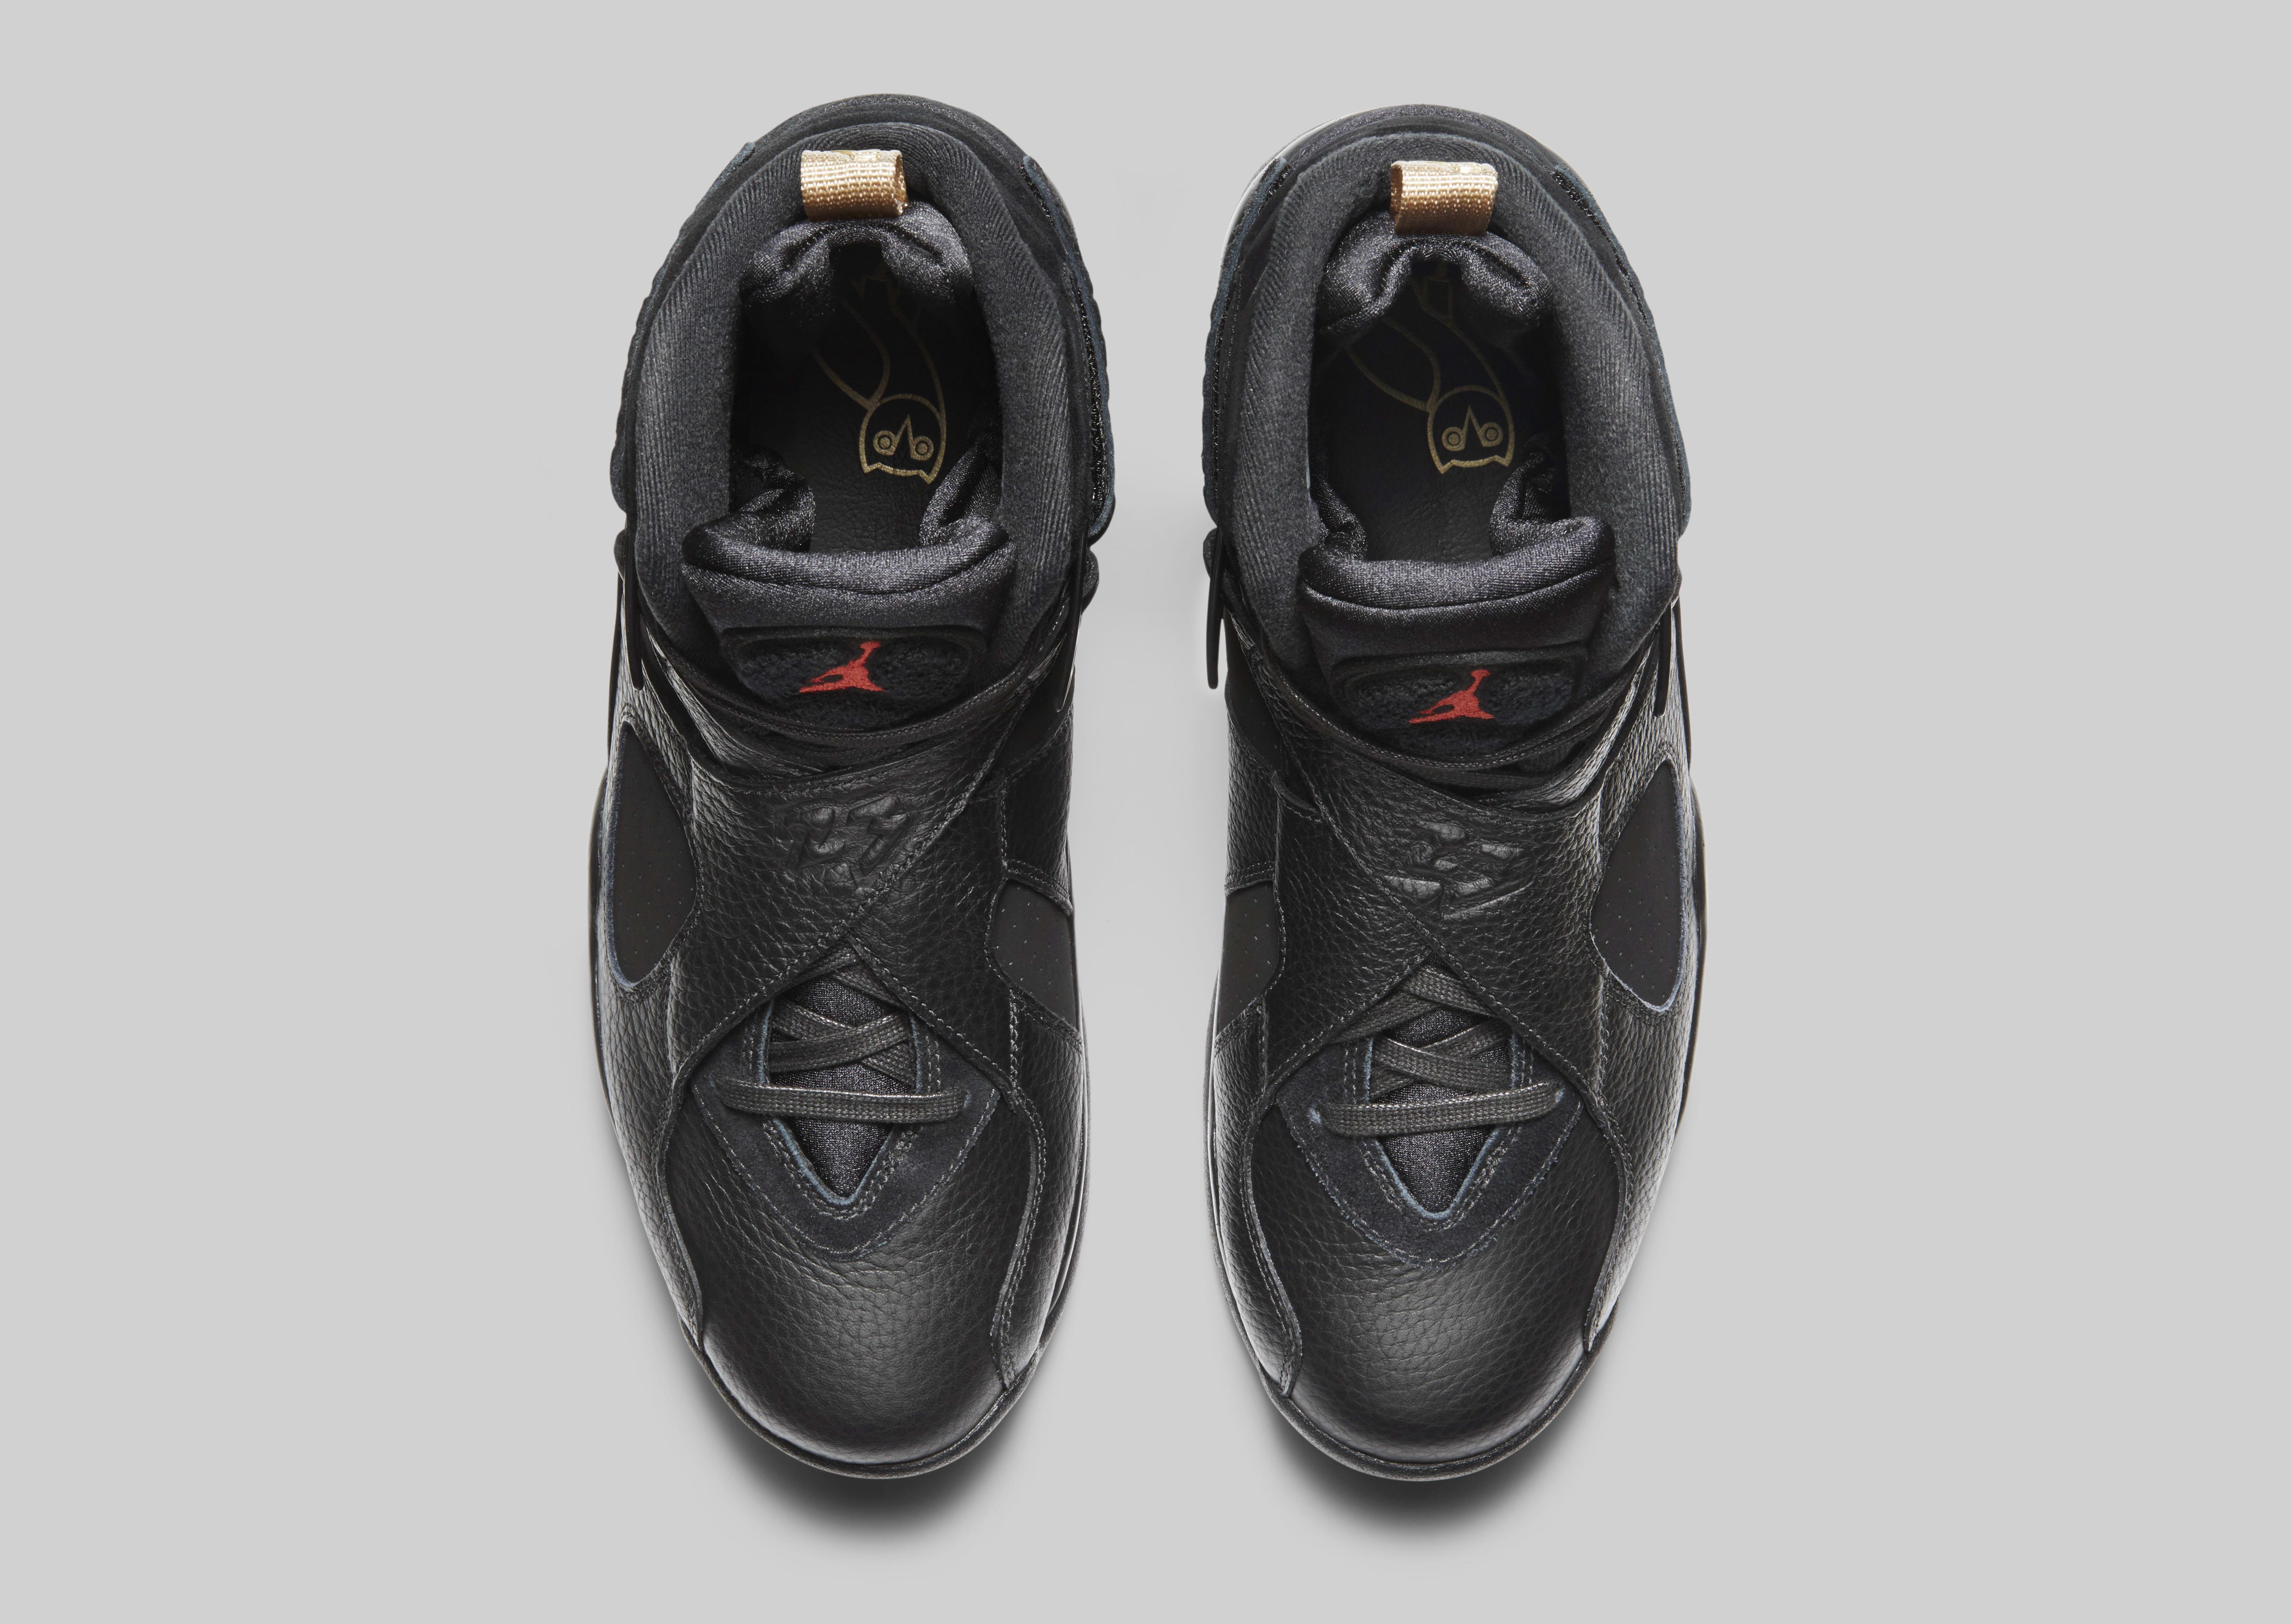 Air Jordan 8 'OVO' Black/Metallic Gold-Varsity Red-Blur AA1239-045 (Top)